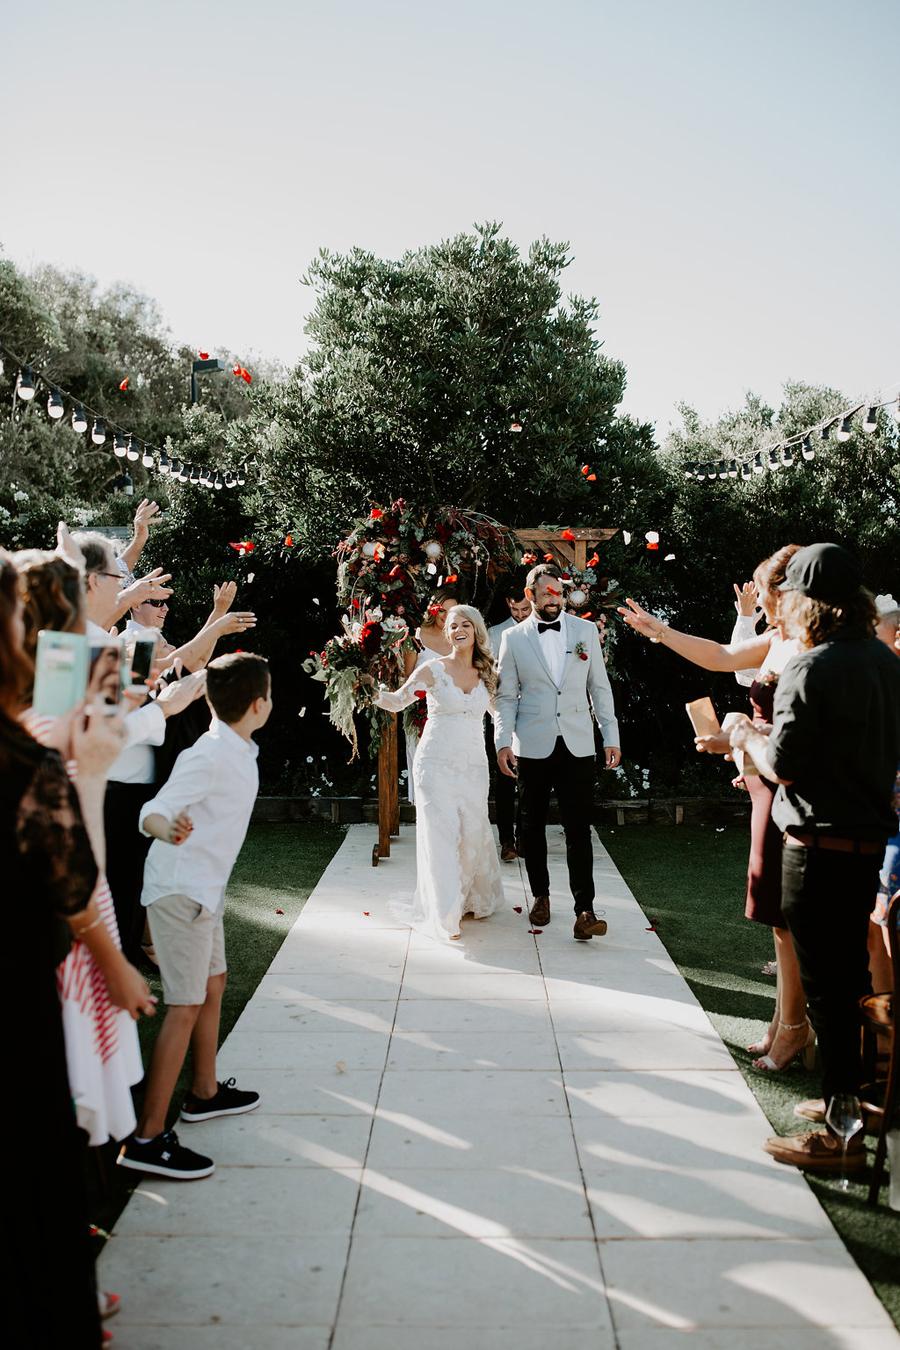 osteria-casuarina-wedding-venue-tweed-coast-weddings-coastal-garden-reception-real-wedding020.jpg